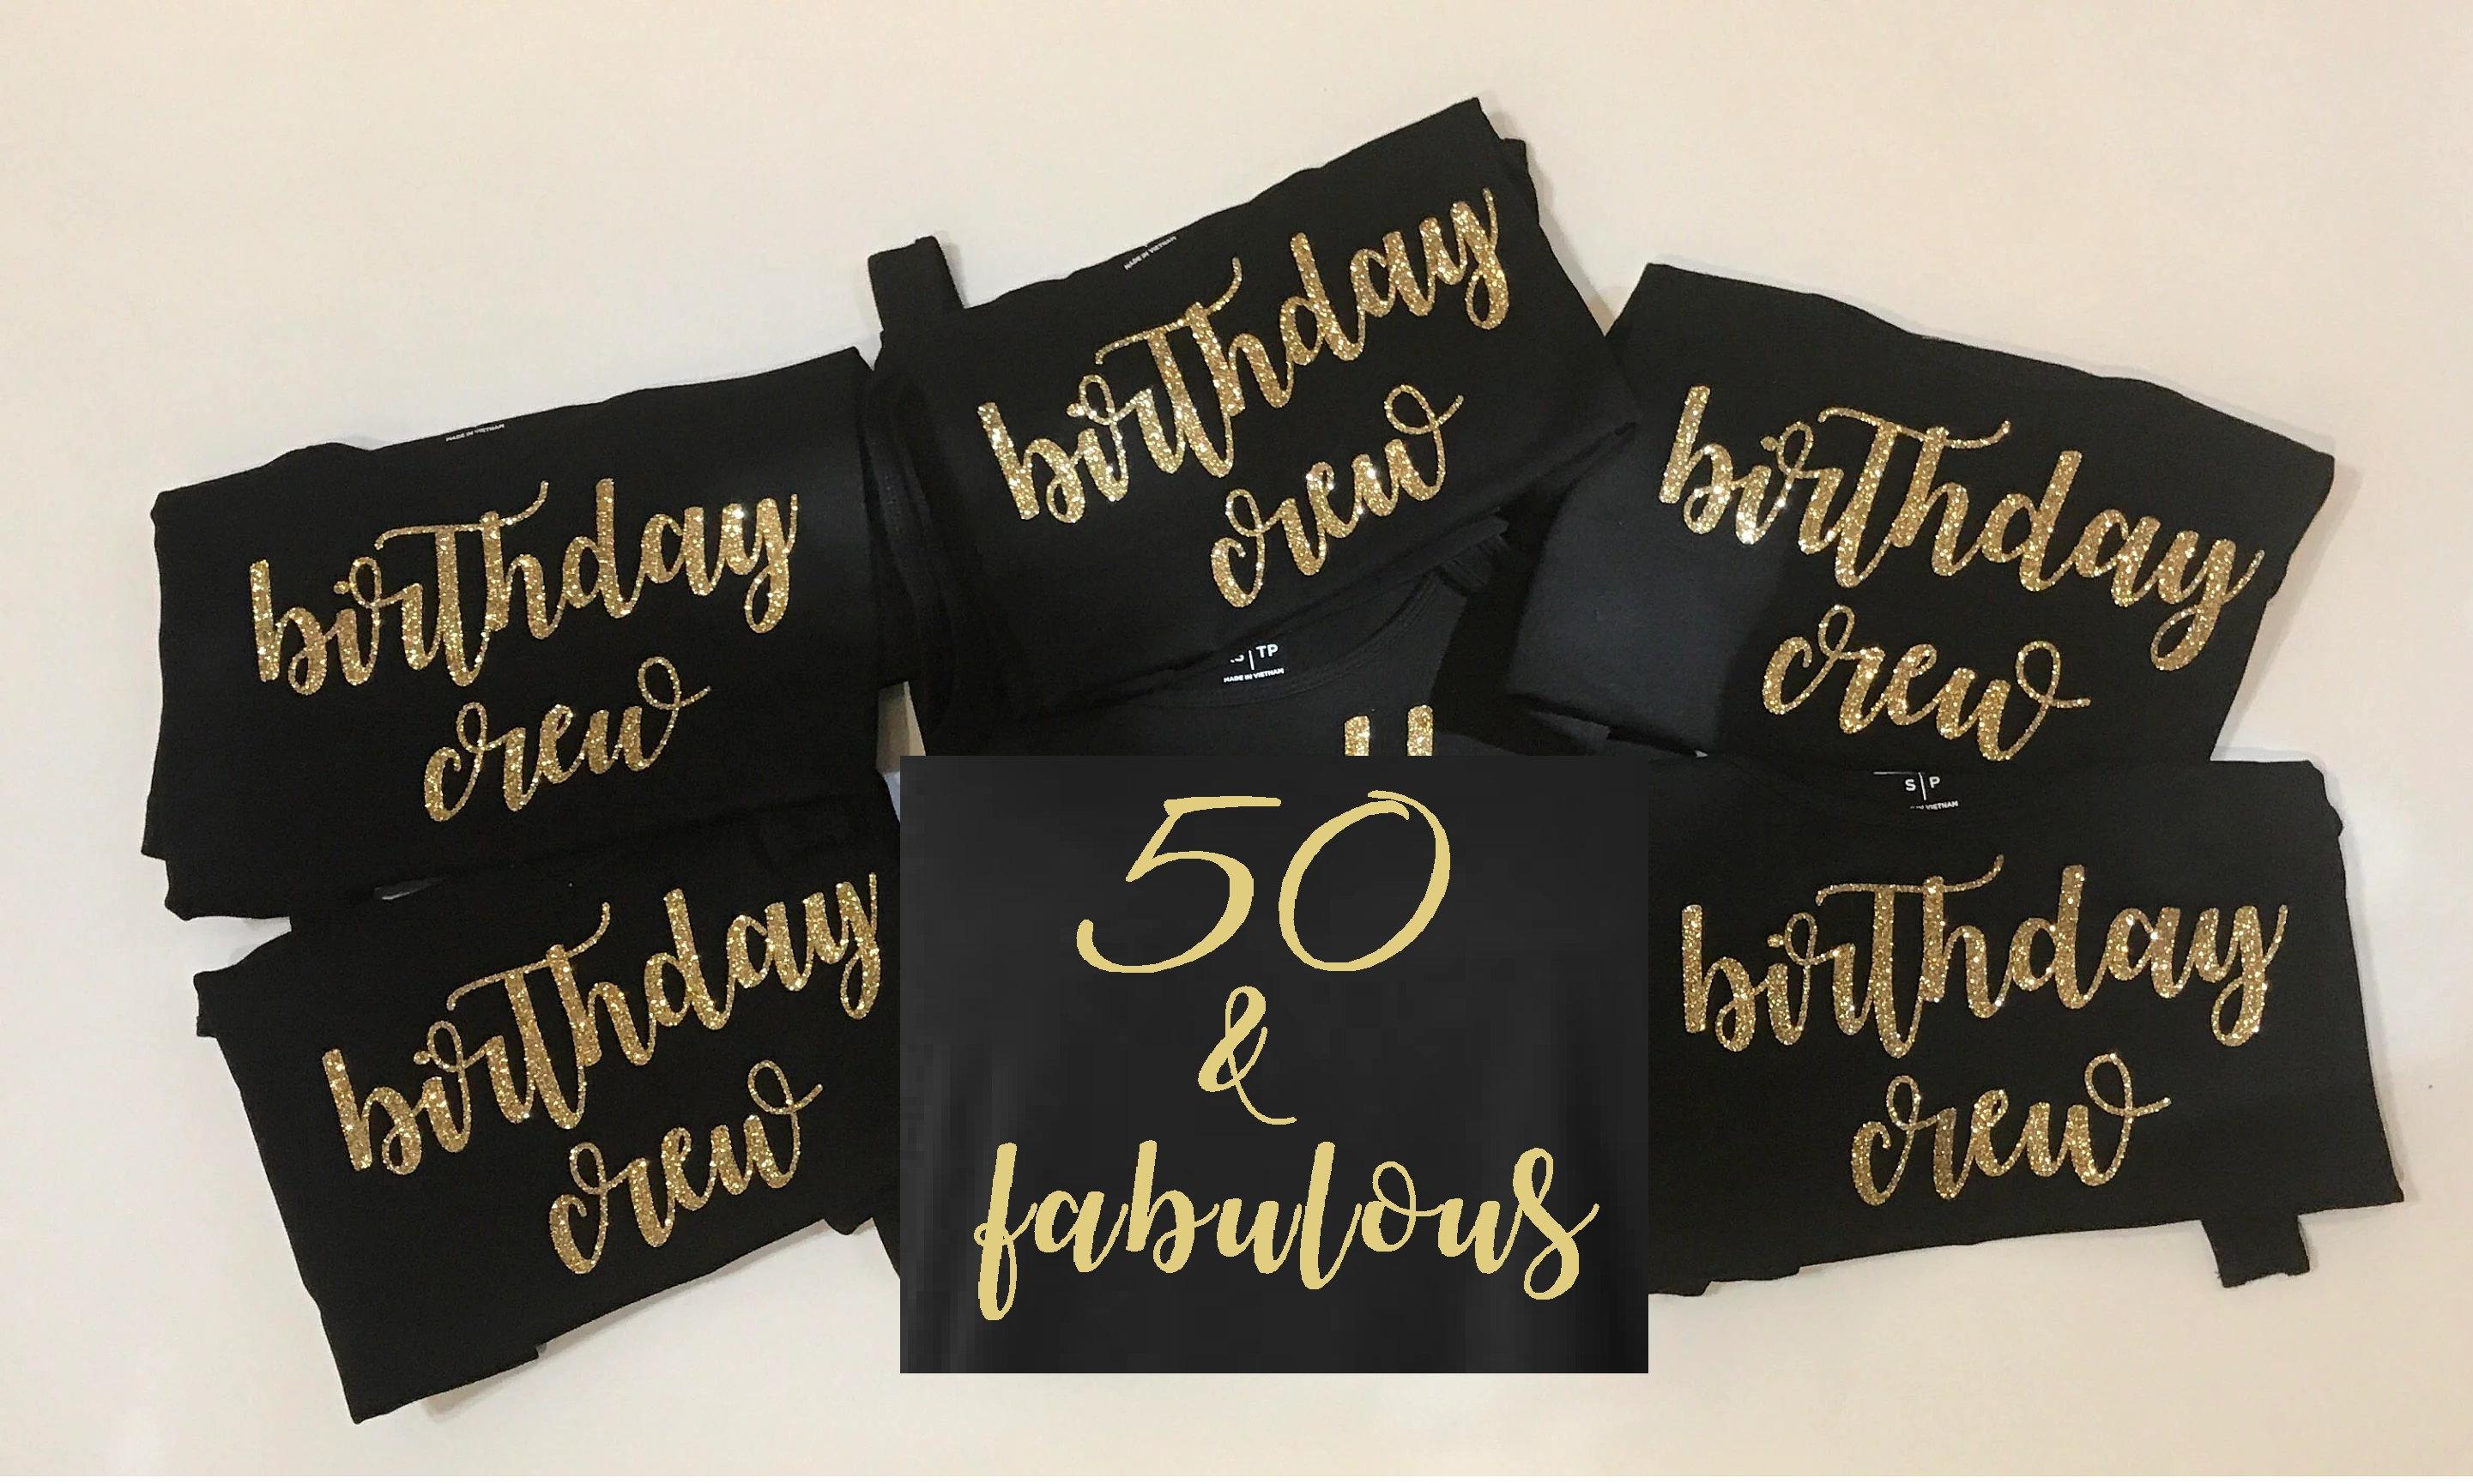 Birthday Crew Group Of 50 Fabulous Glitter Shirts